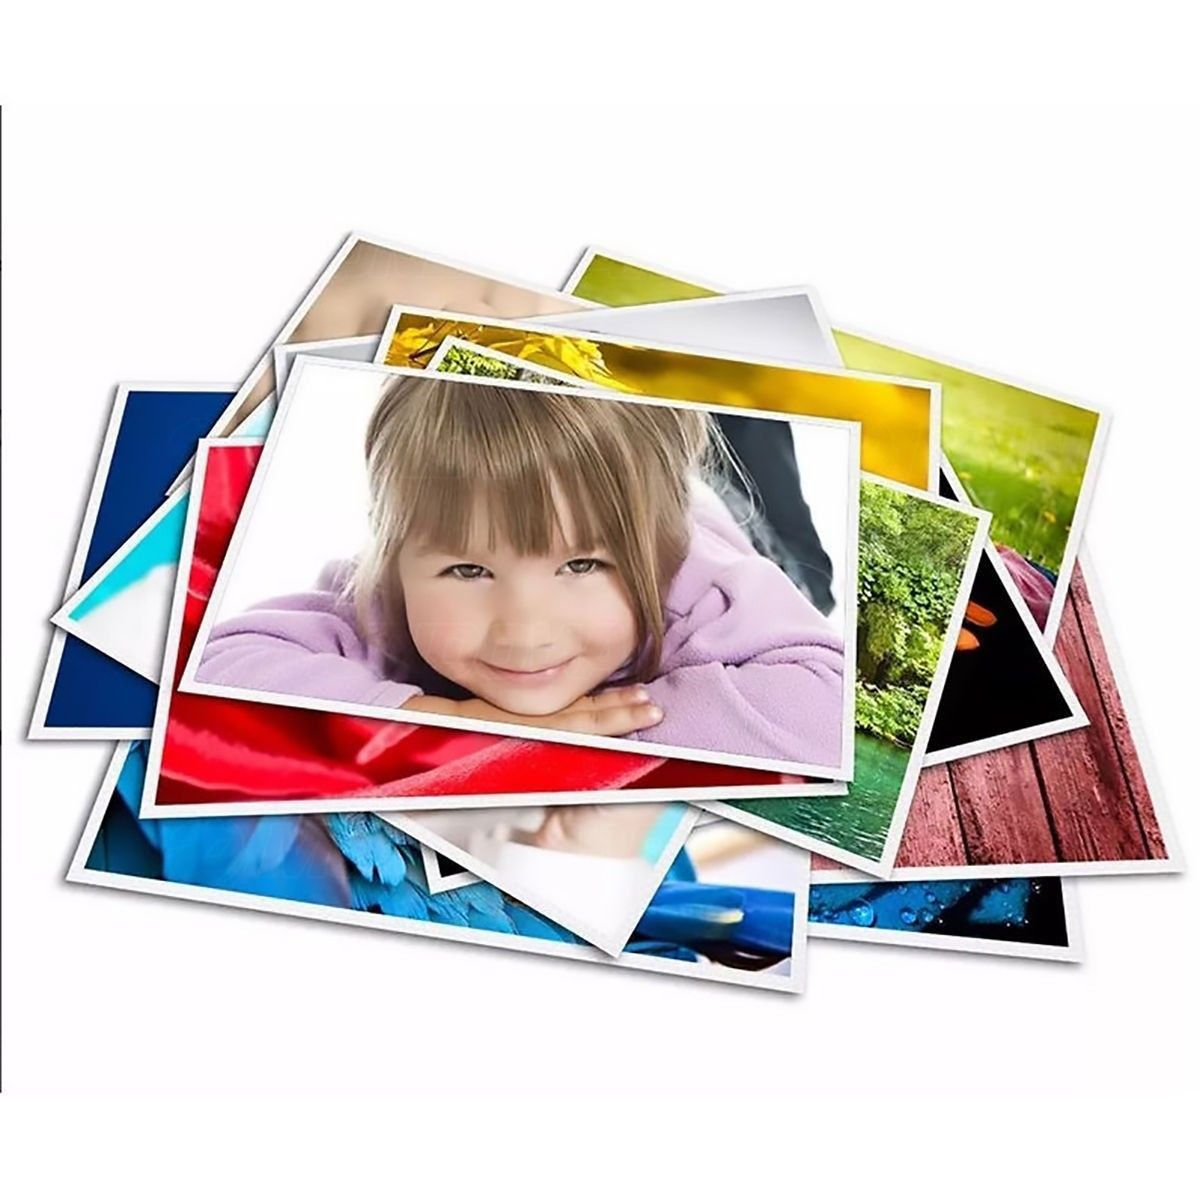 Papel Fotográfico 180g A4  20 Folhas